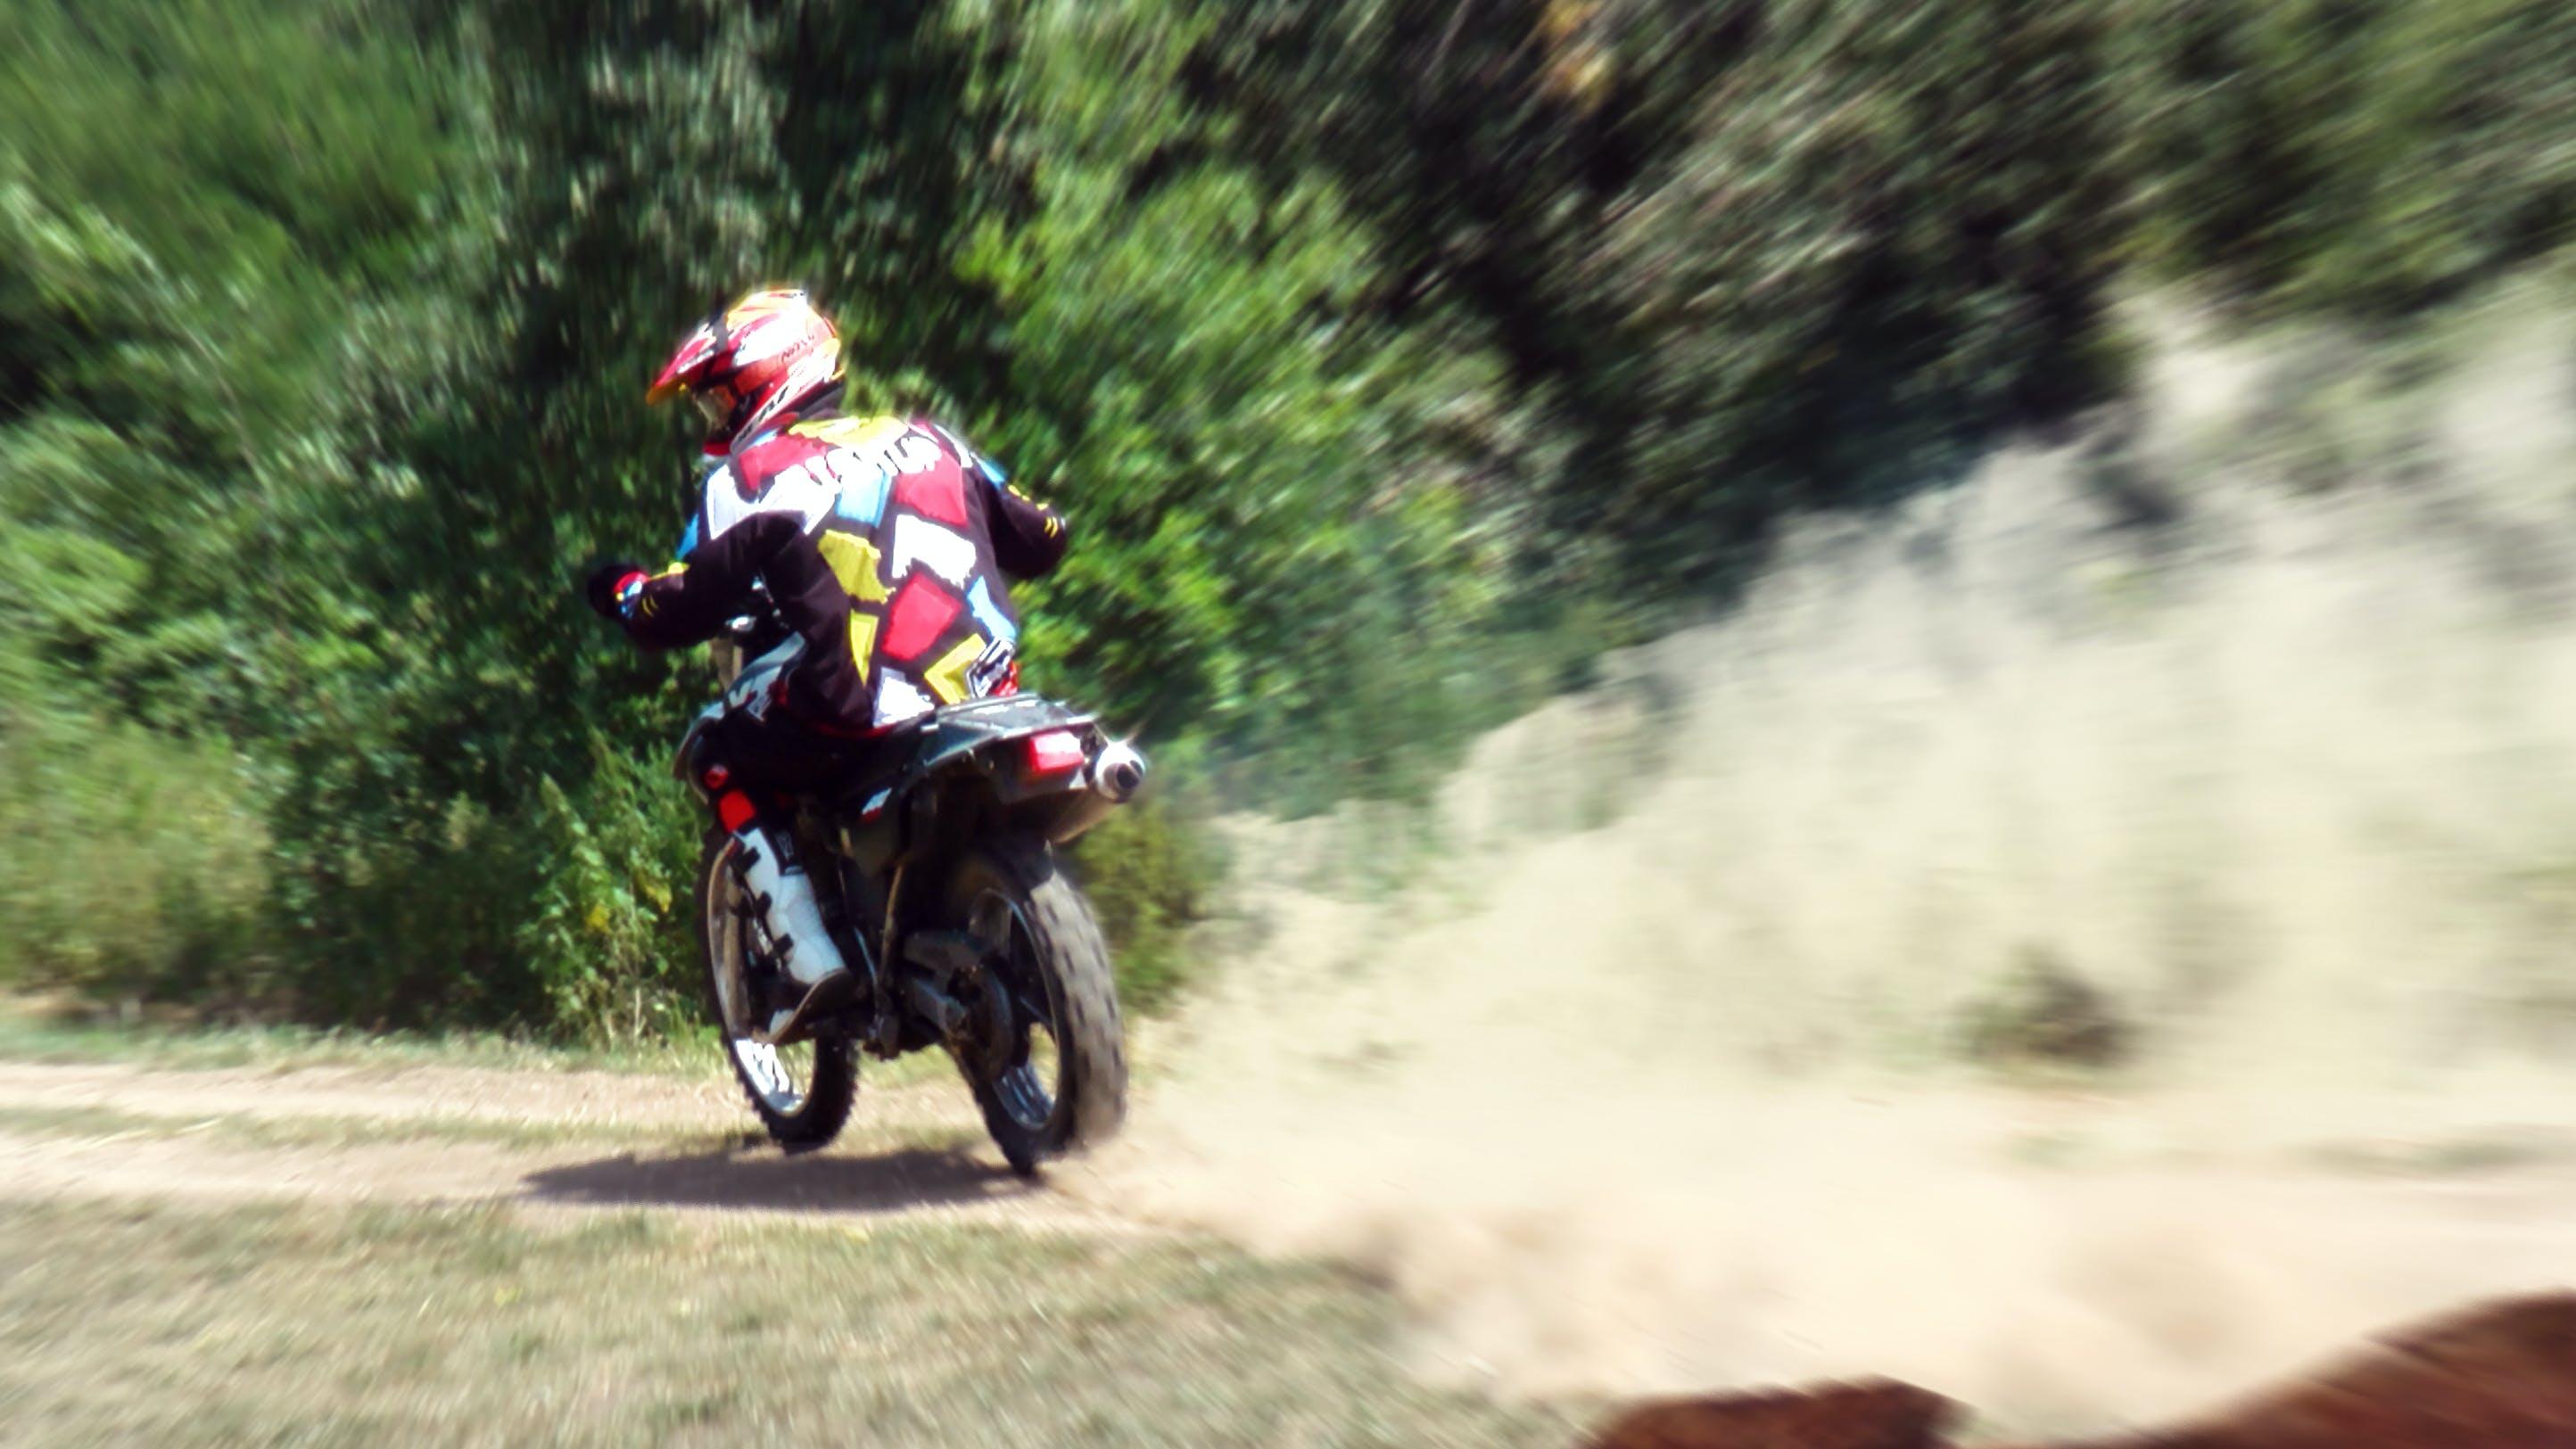 Free stock photo of accelerate, acceleration, bike racing, cross